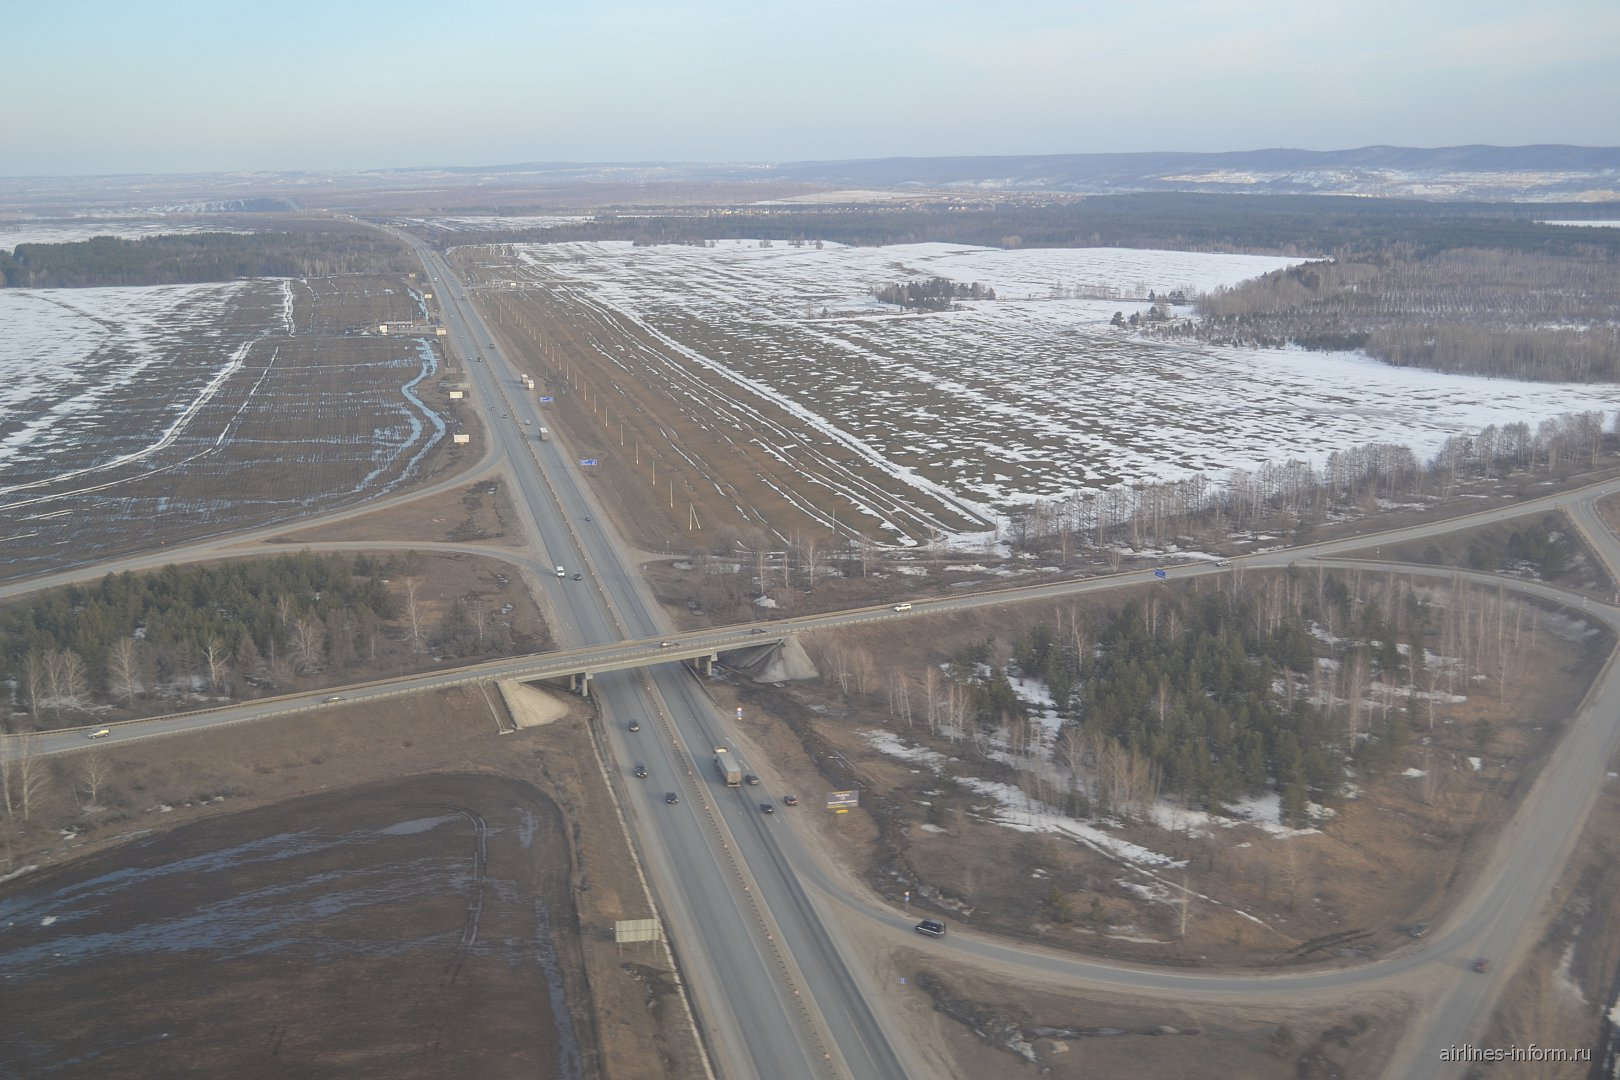 Вид на автотрассу М-5 перед посадкой в аэропорту Курумоч